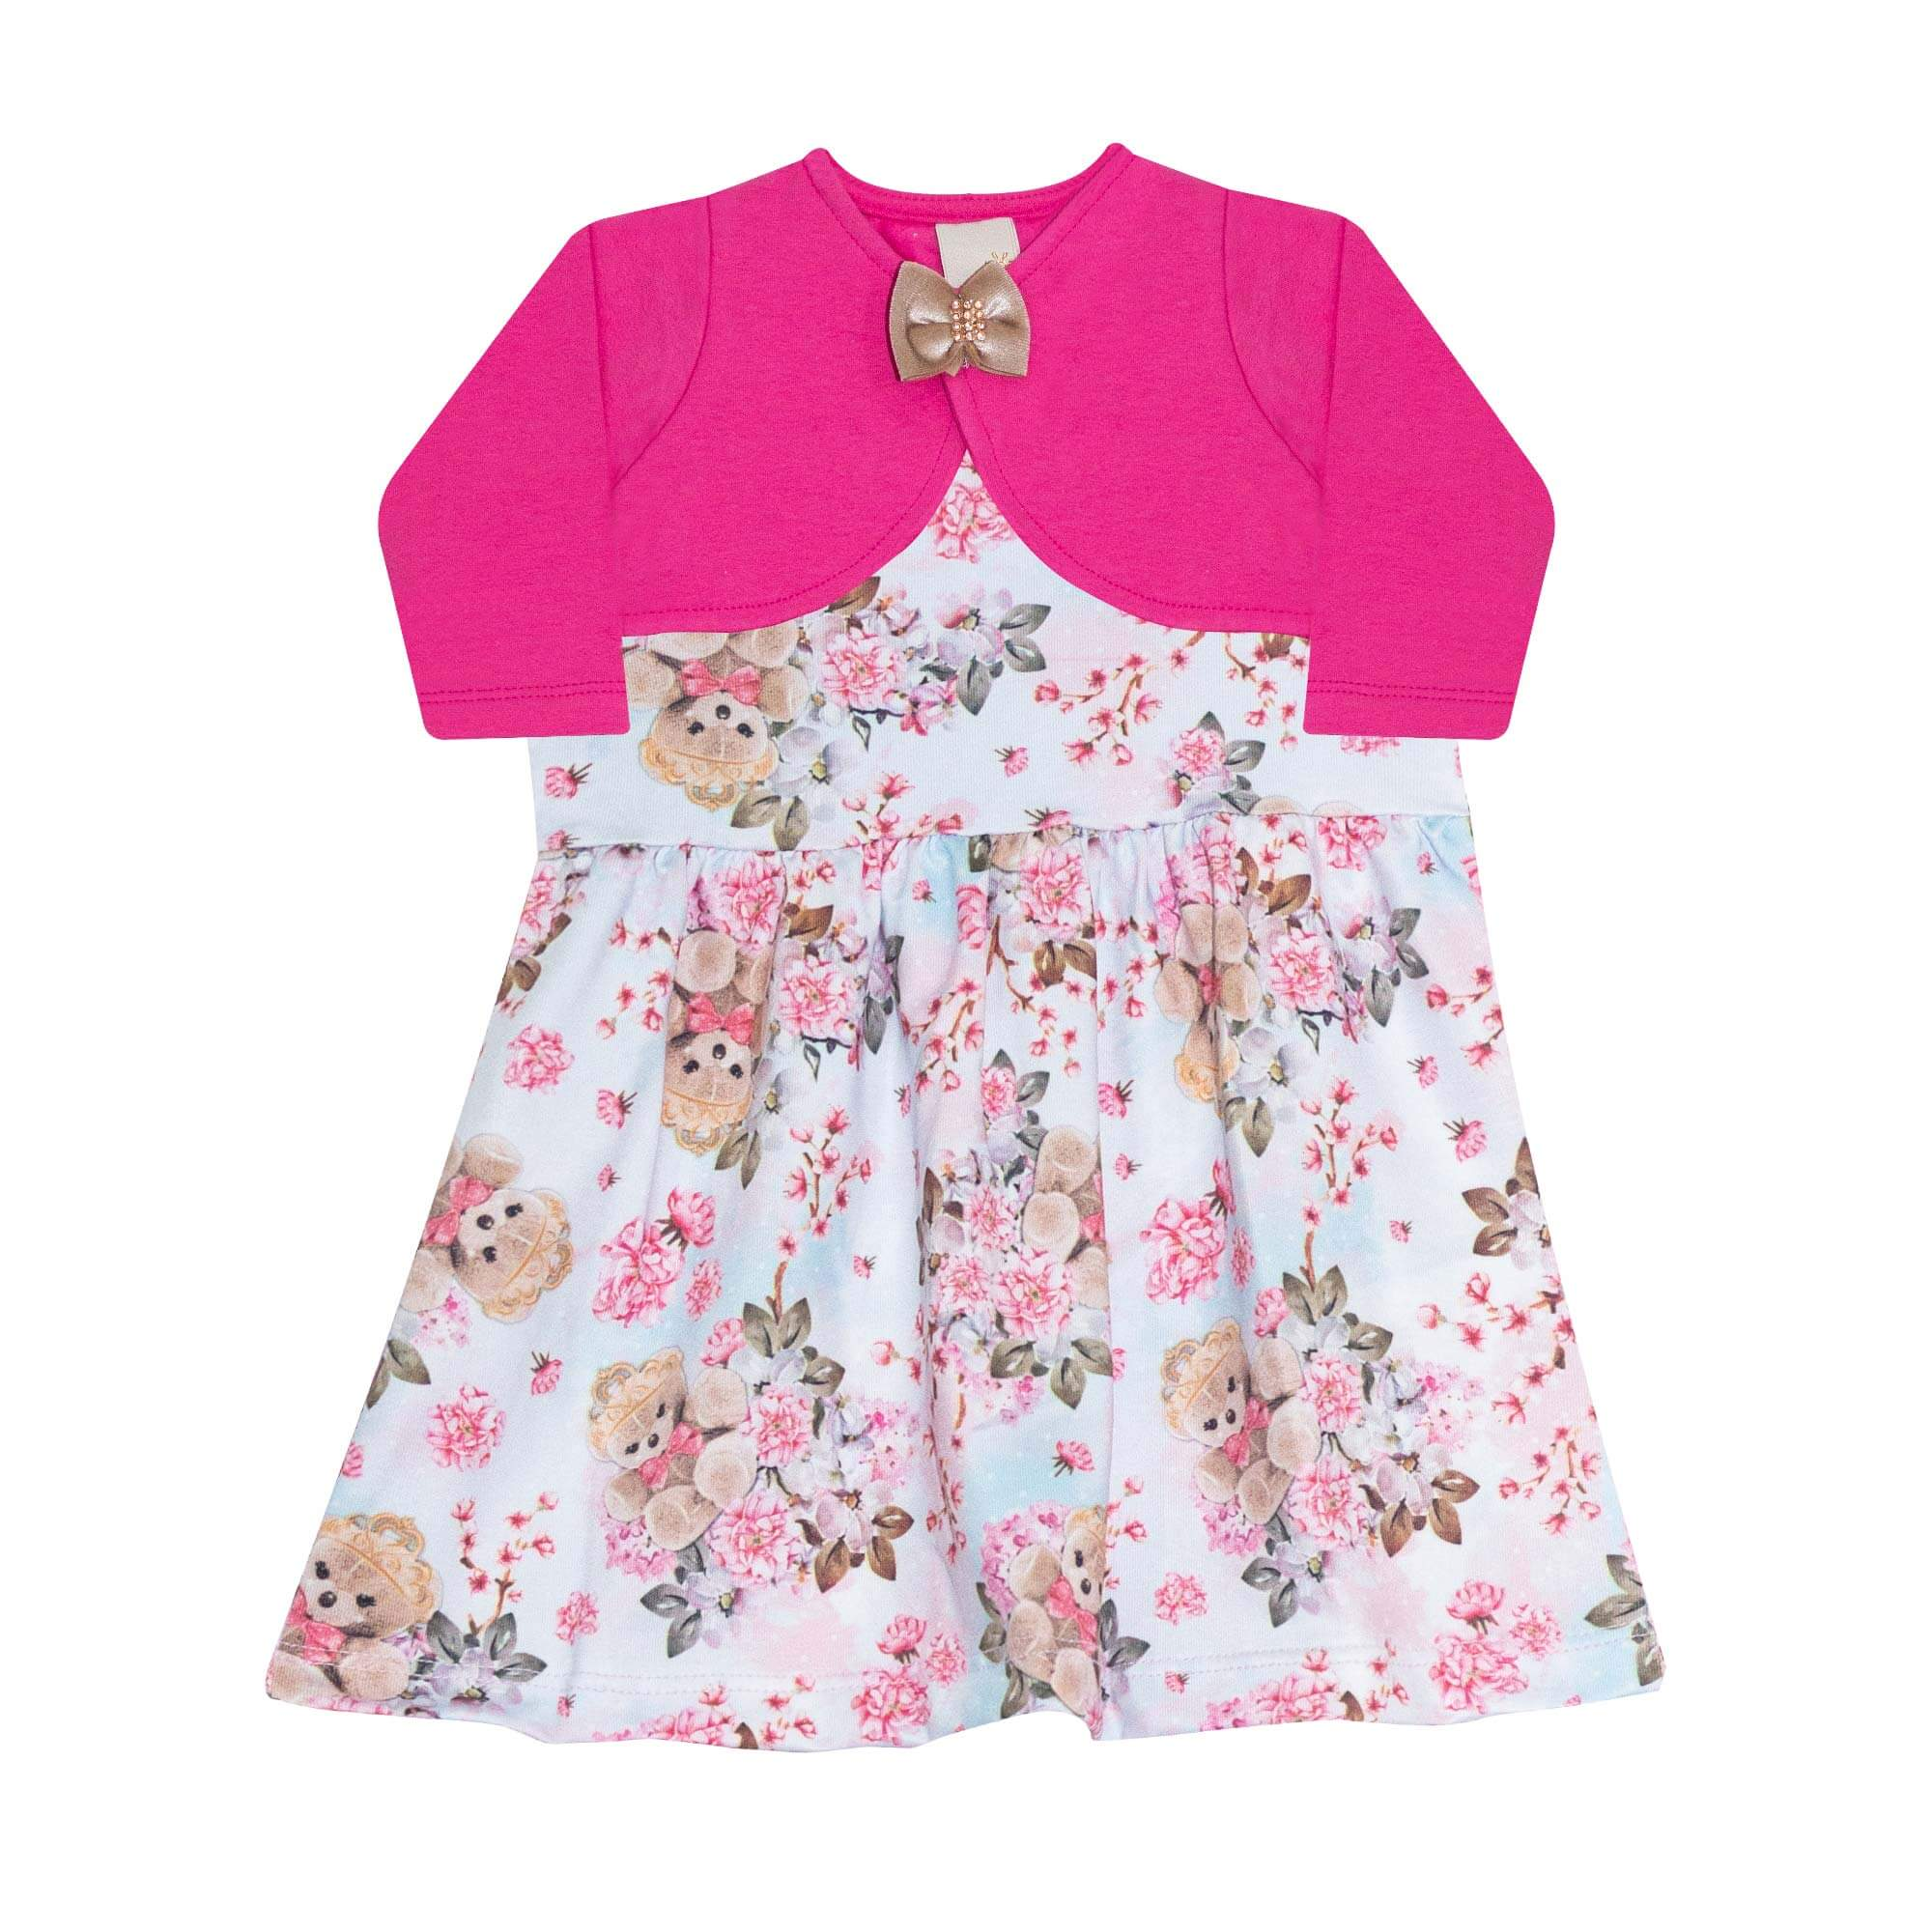 Vestido Infantil Feminino + Bolero - Ref 7441 - Pink - Ralakids